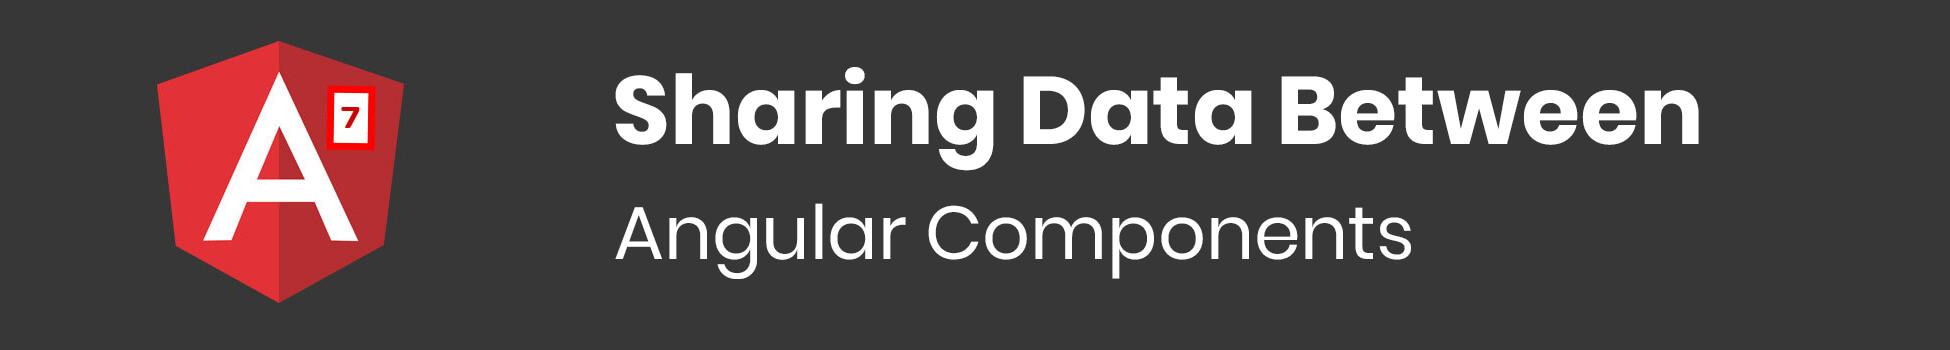 https://www.study24x7.com/article/510/sharing-data-be...